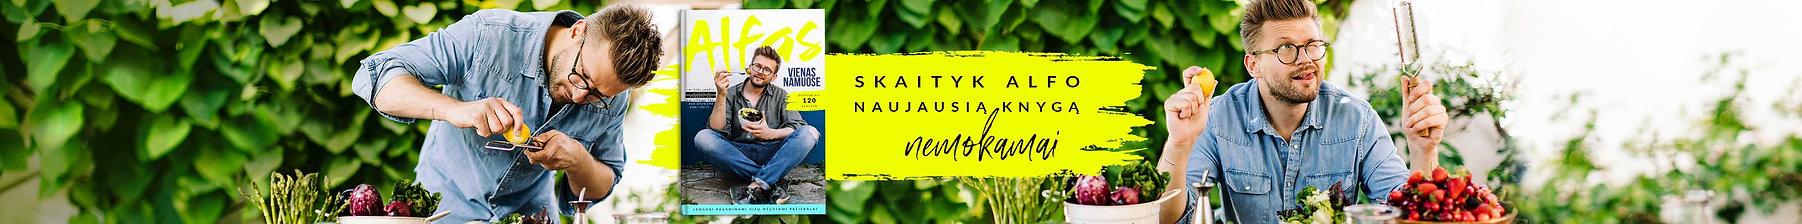 Alfo Ivanausko knyga vmg online